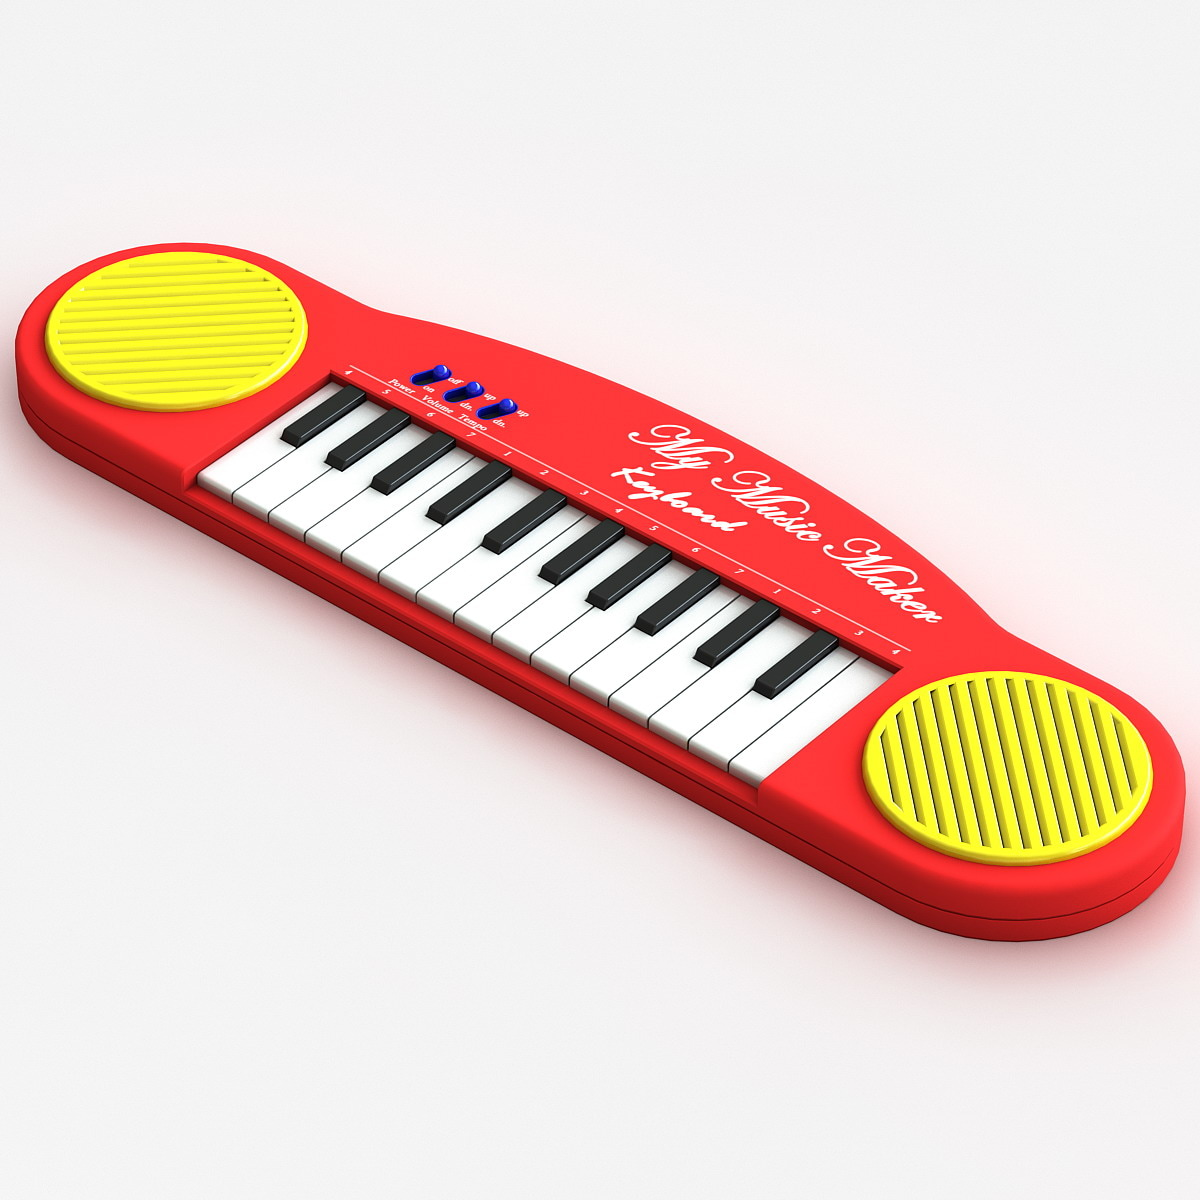 c4d electronics toy keyboard